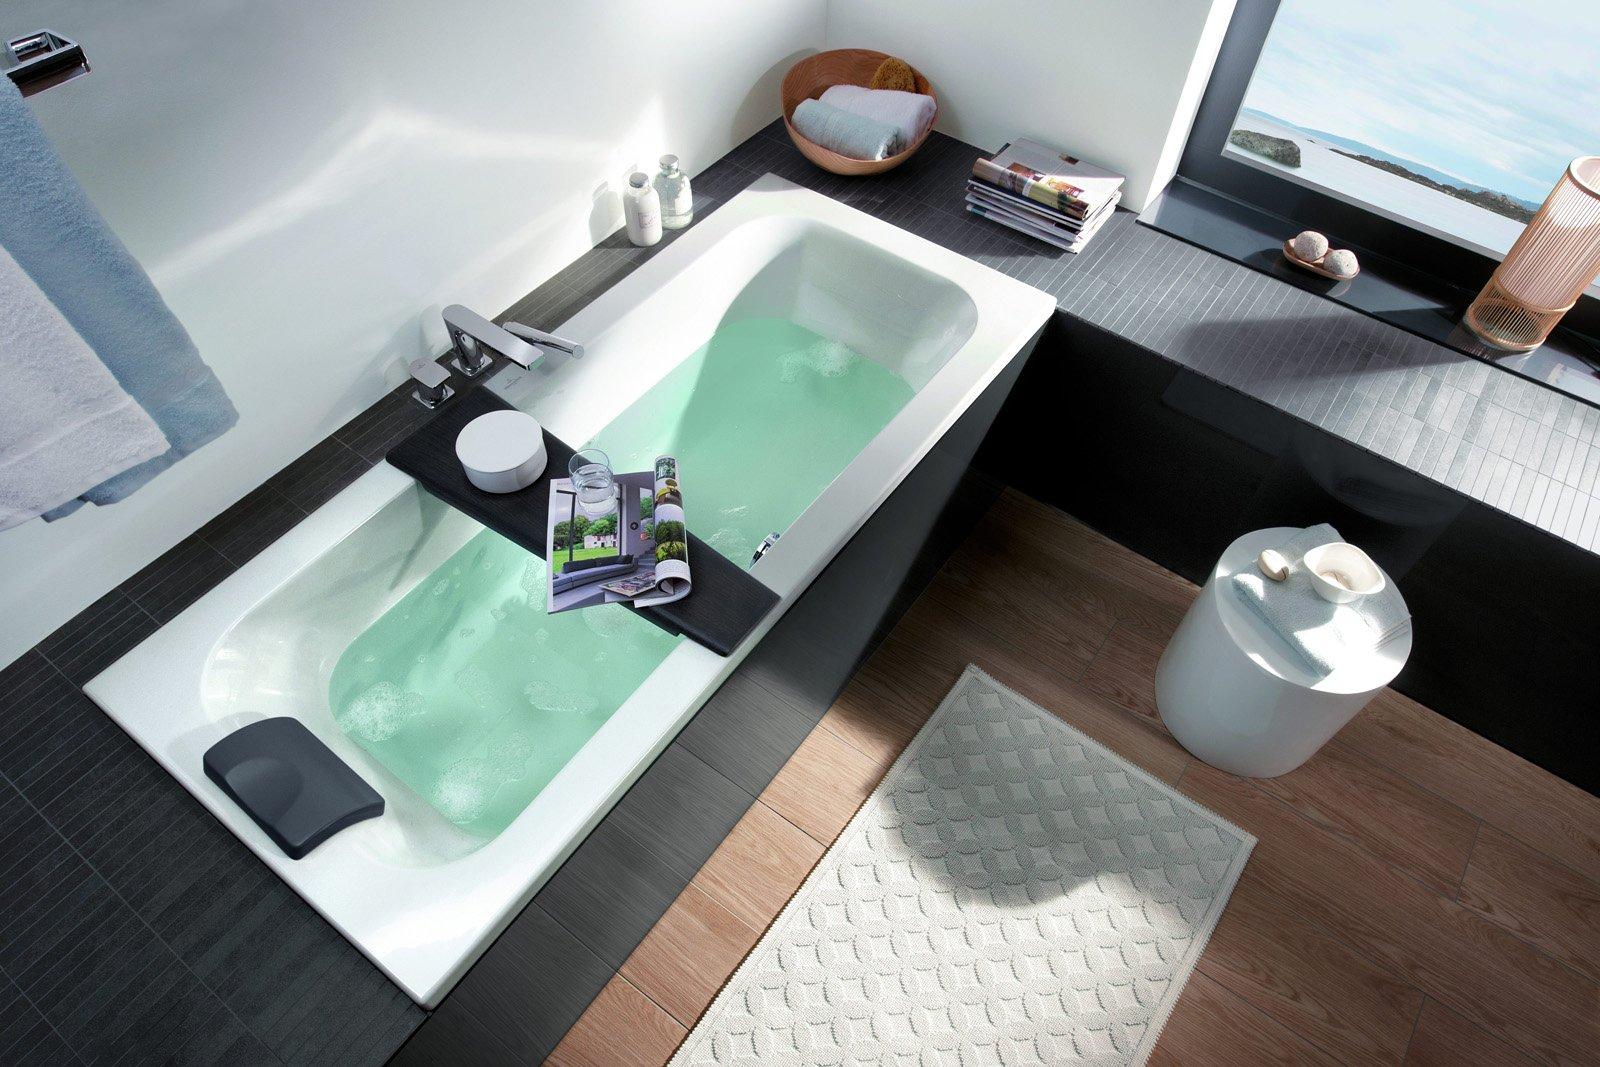 Vasca Da Bagno Economica : Vasche da bagno piccole cose di casa